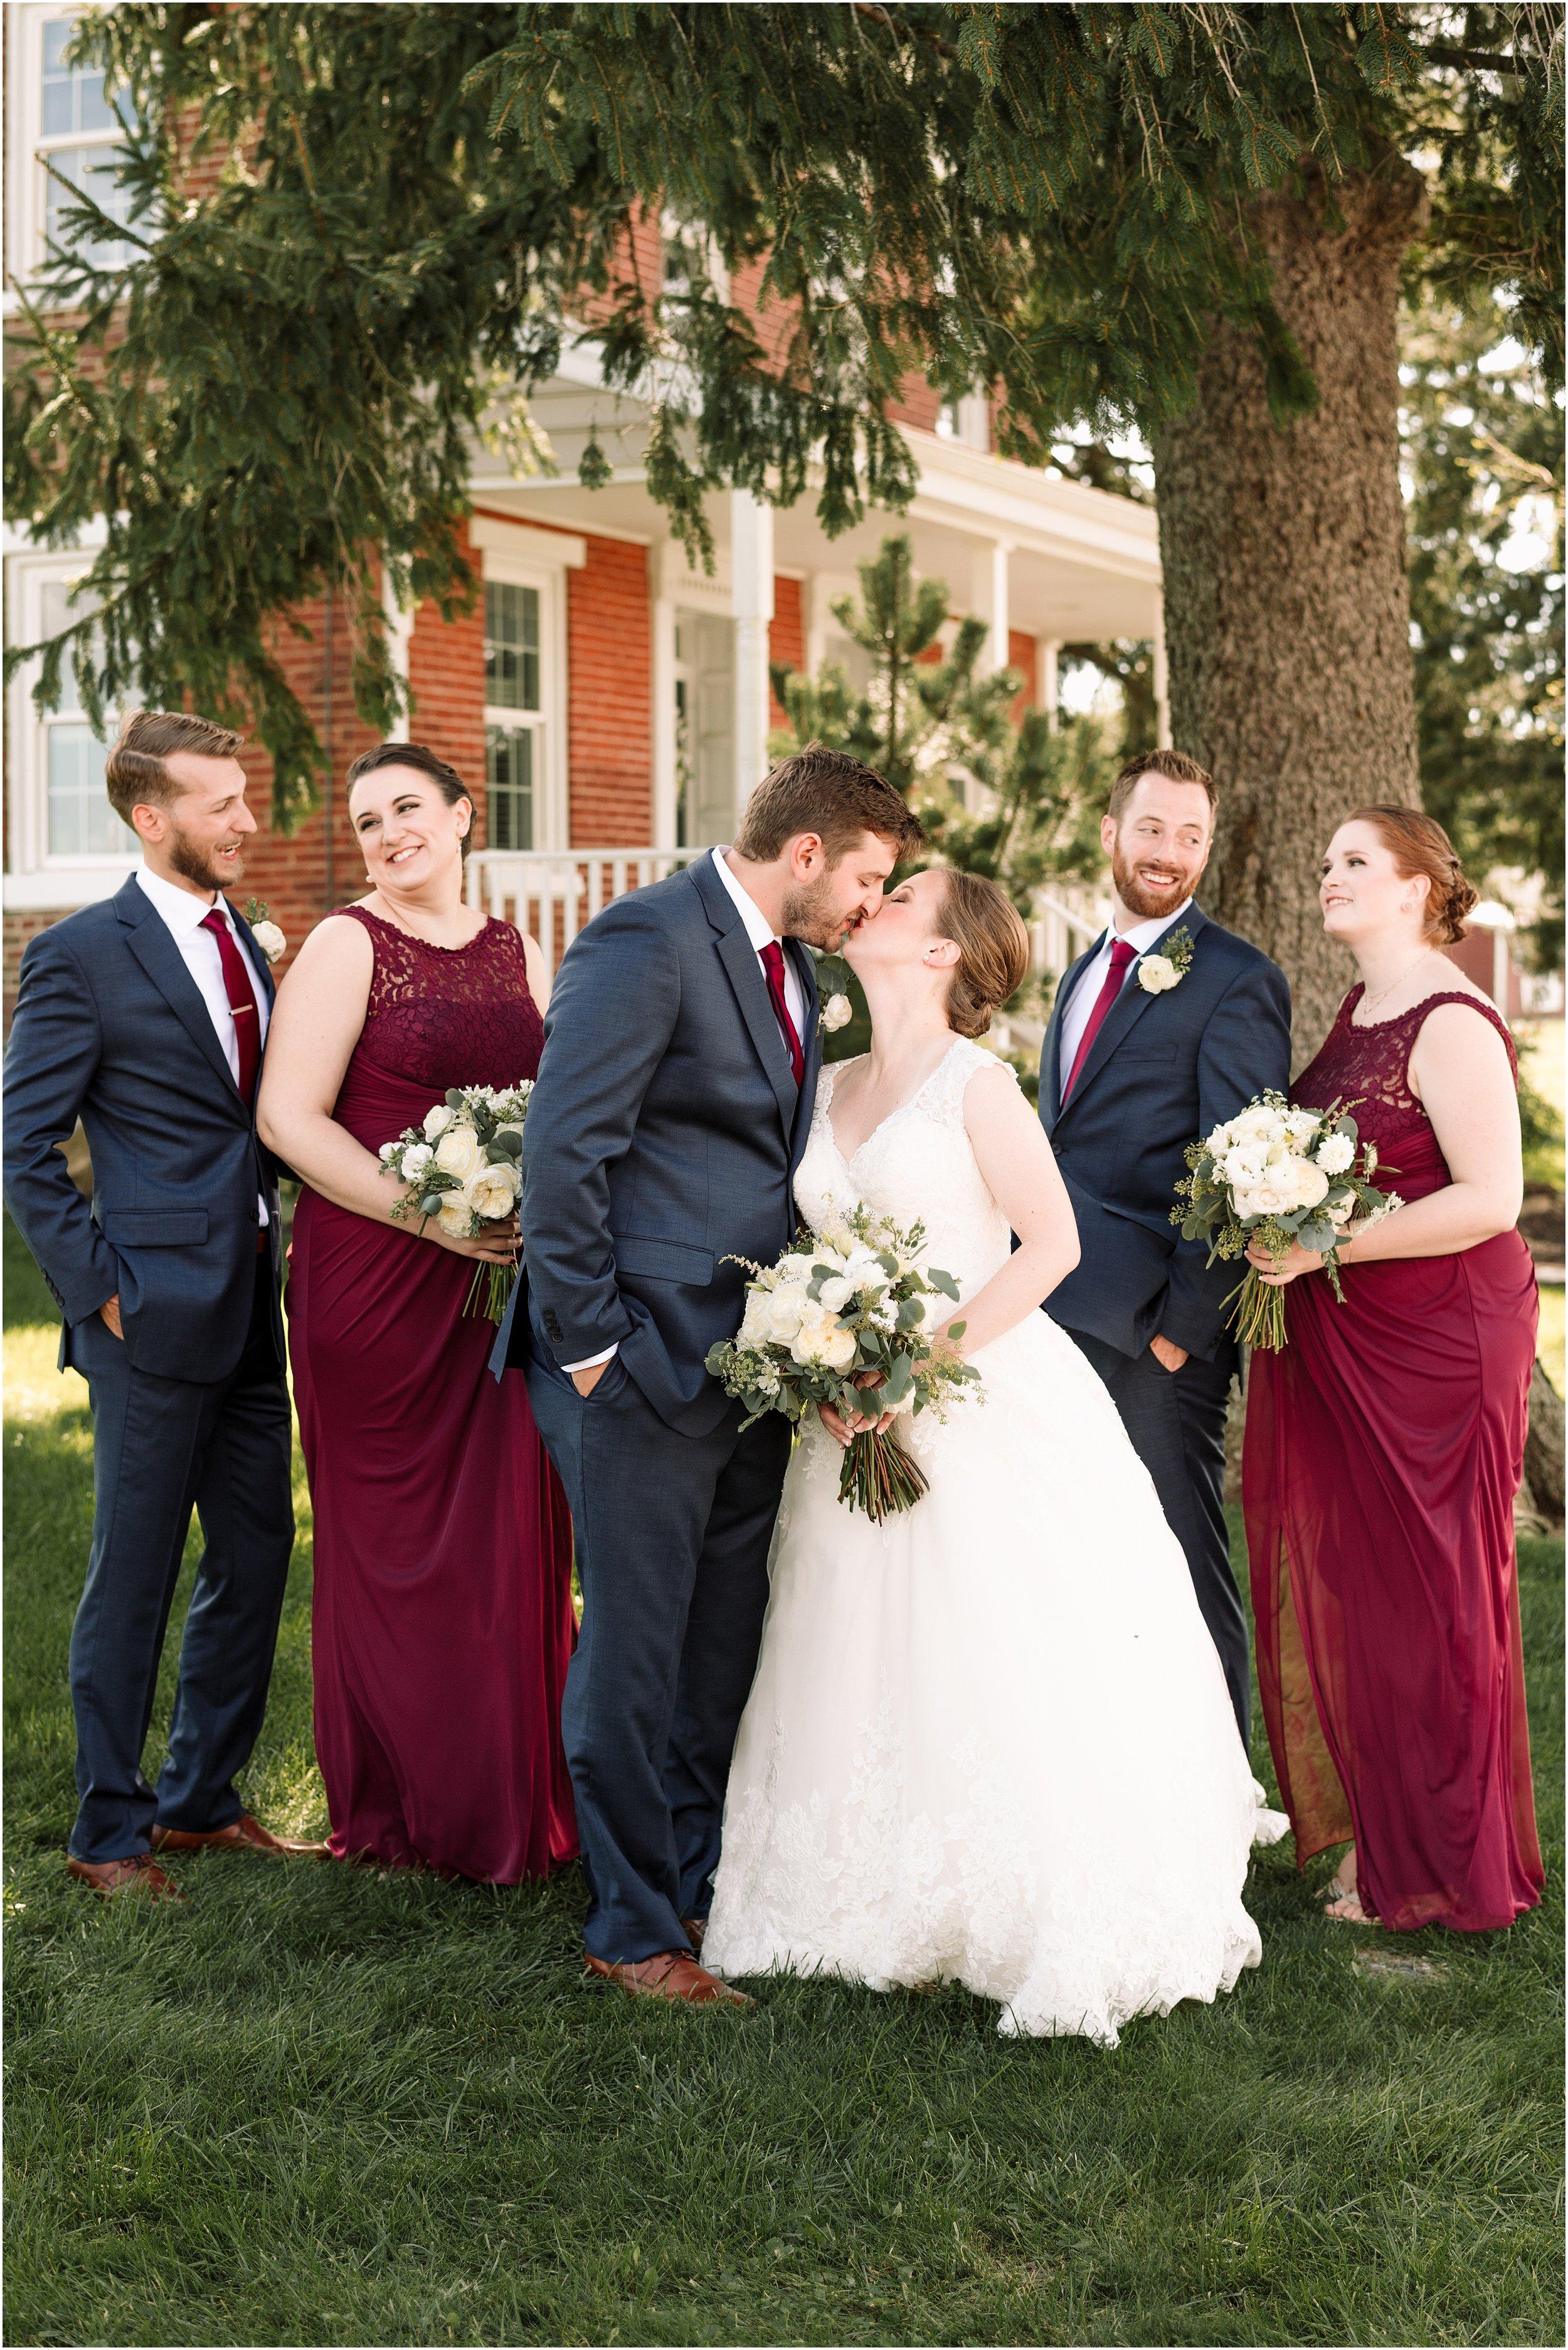 hannah leigh photography Wyndridge Farm Wedding York PA_1515.jpg